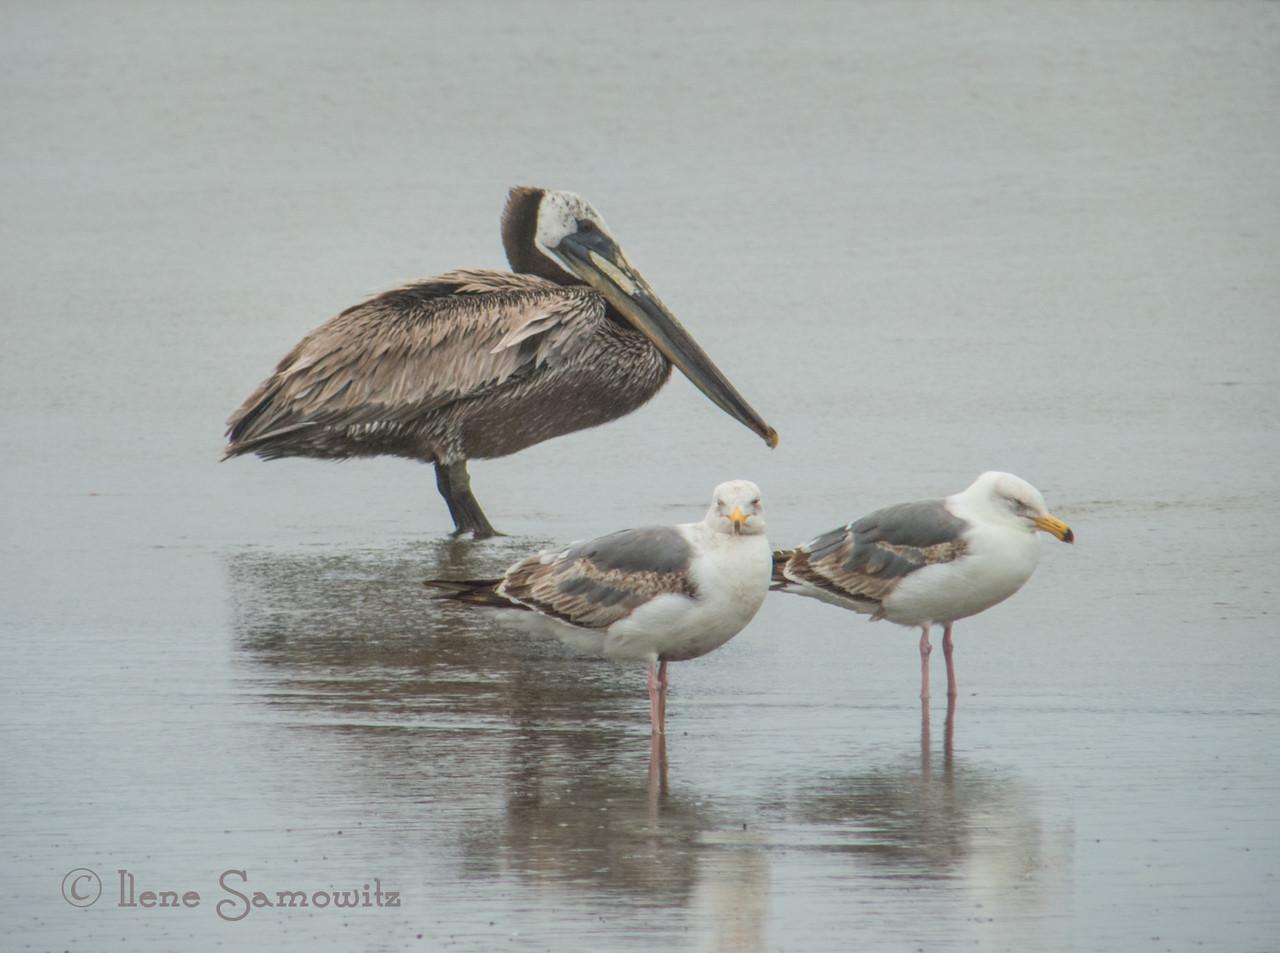 The trio of birds in Bandon, OR.